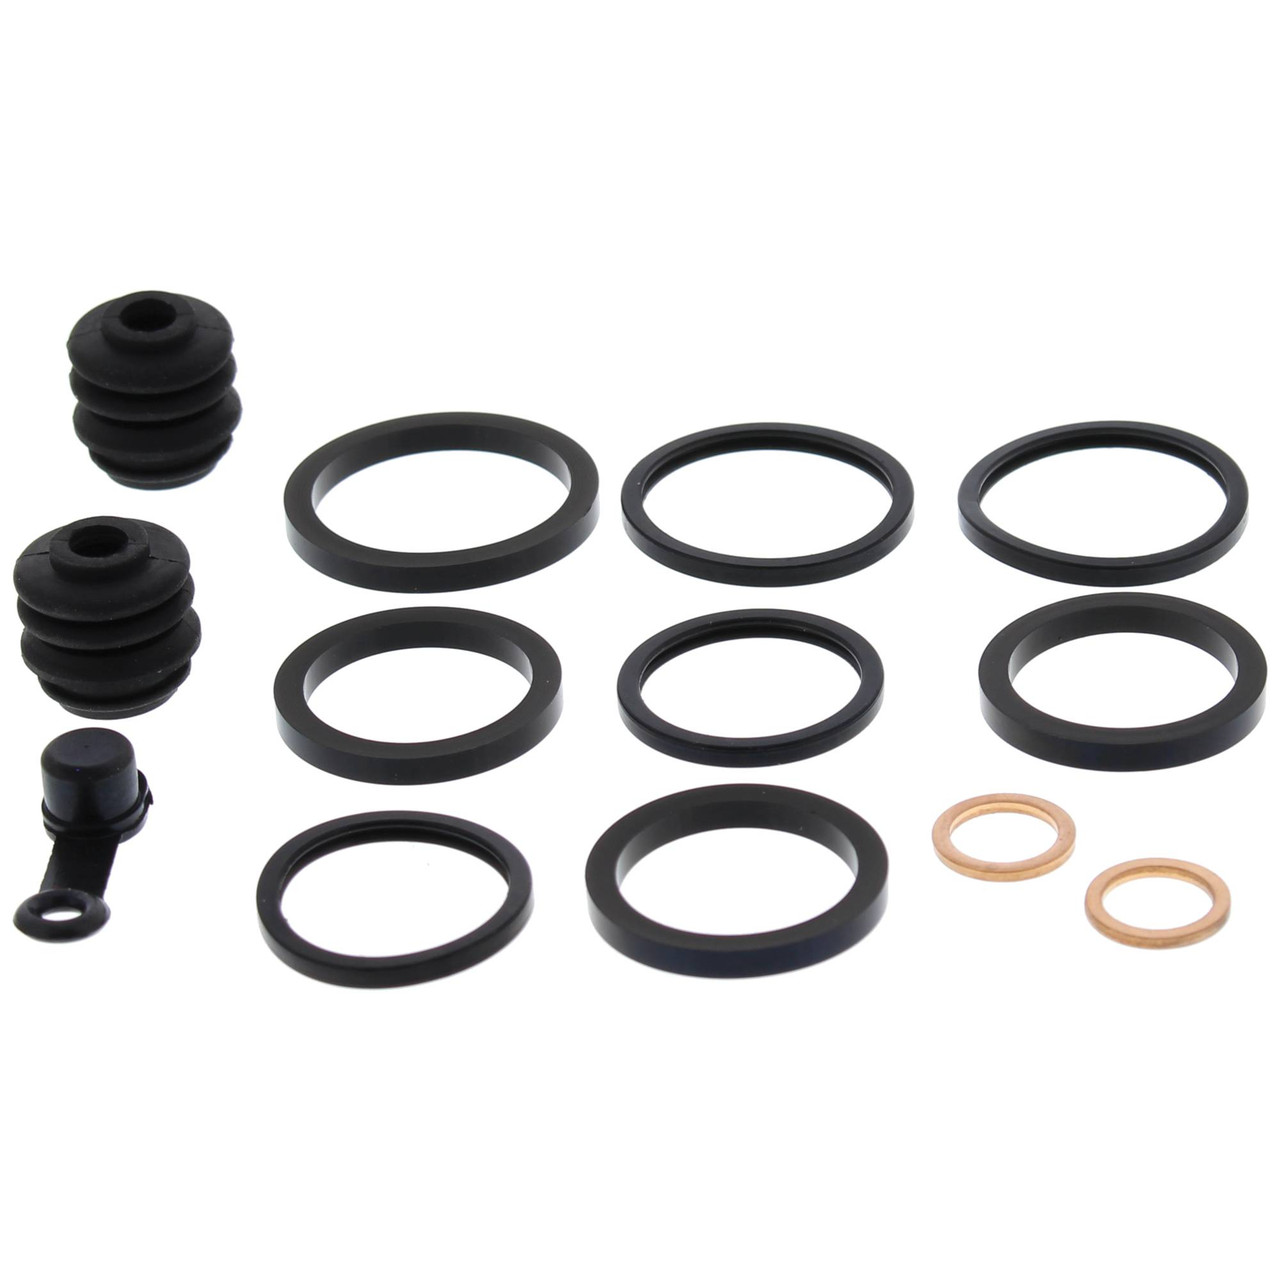 Details about  /All Balls Racing Caliper Rebuild Kit~2009 Yamaha XT250 Pivot Works 18-3080